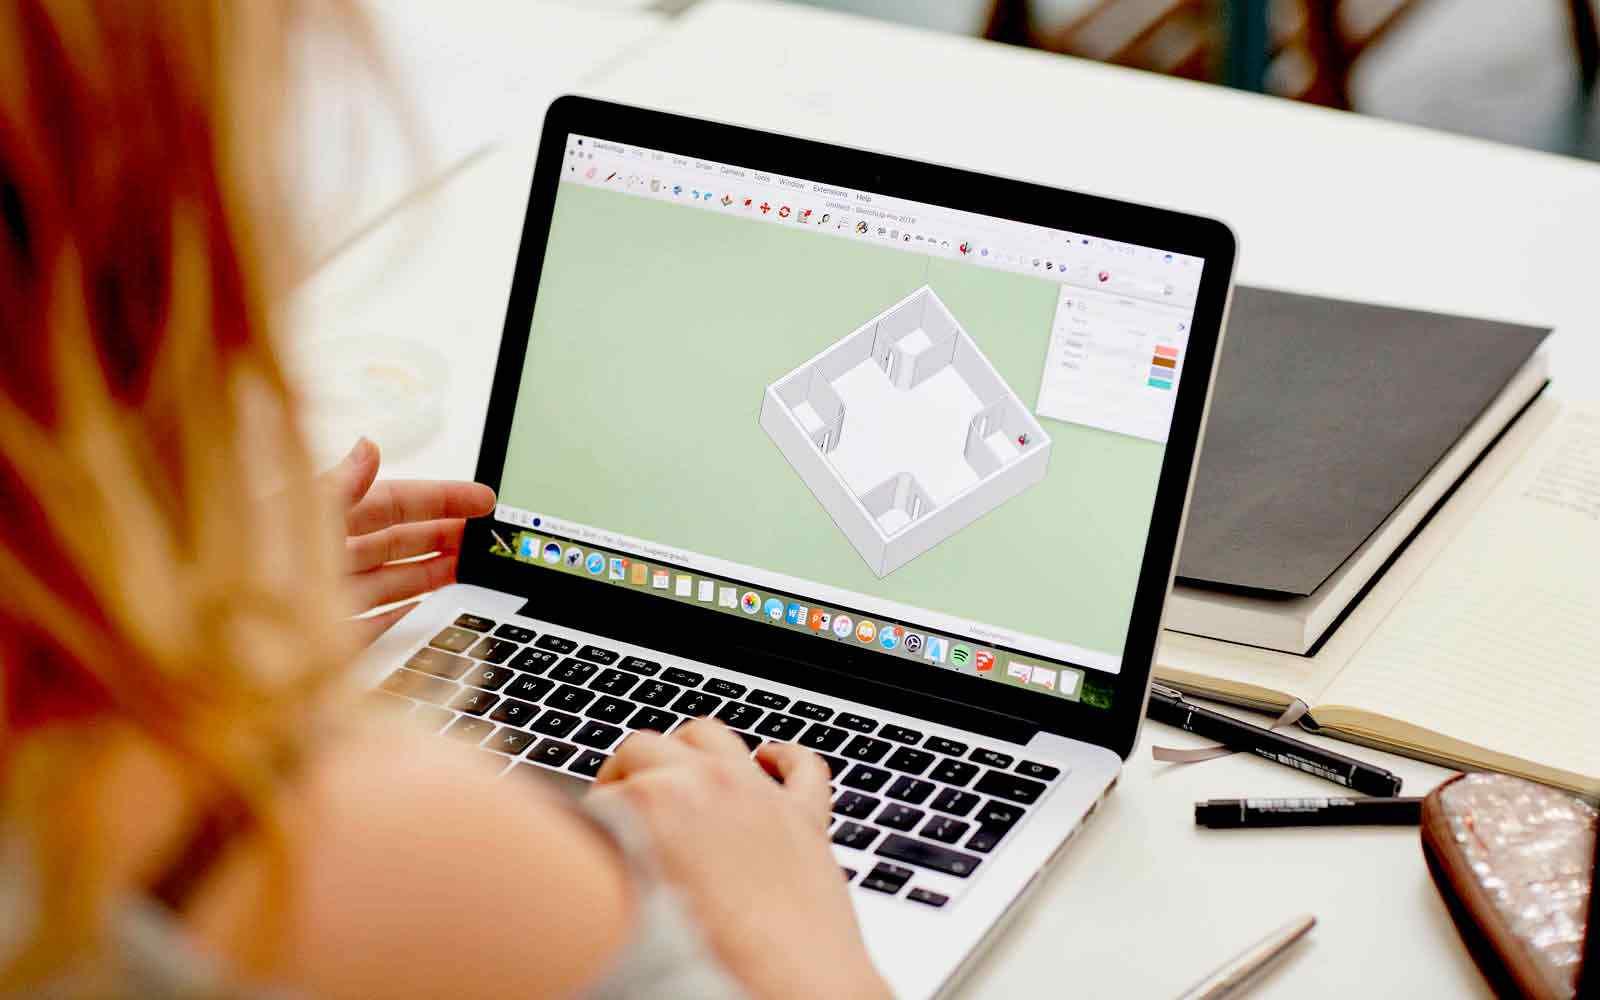 Student using interior design software